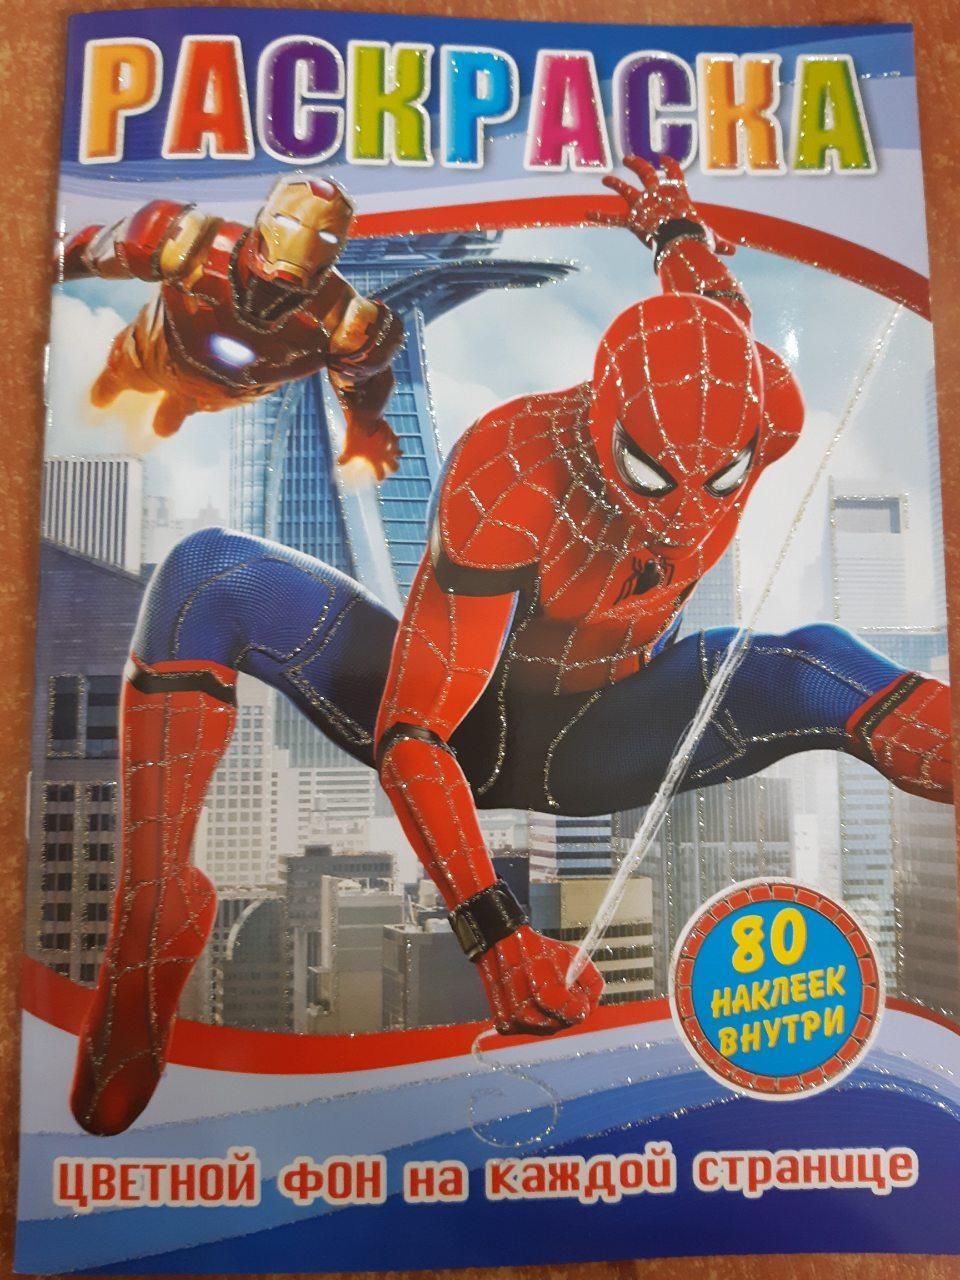 Колибри Раскраска Р-10: 80 наклеек/человек паук: продажа ...